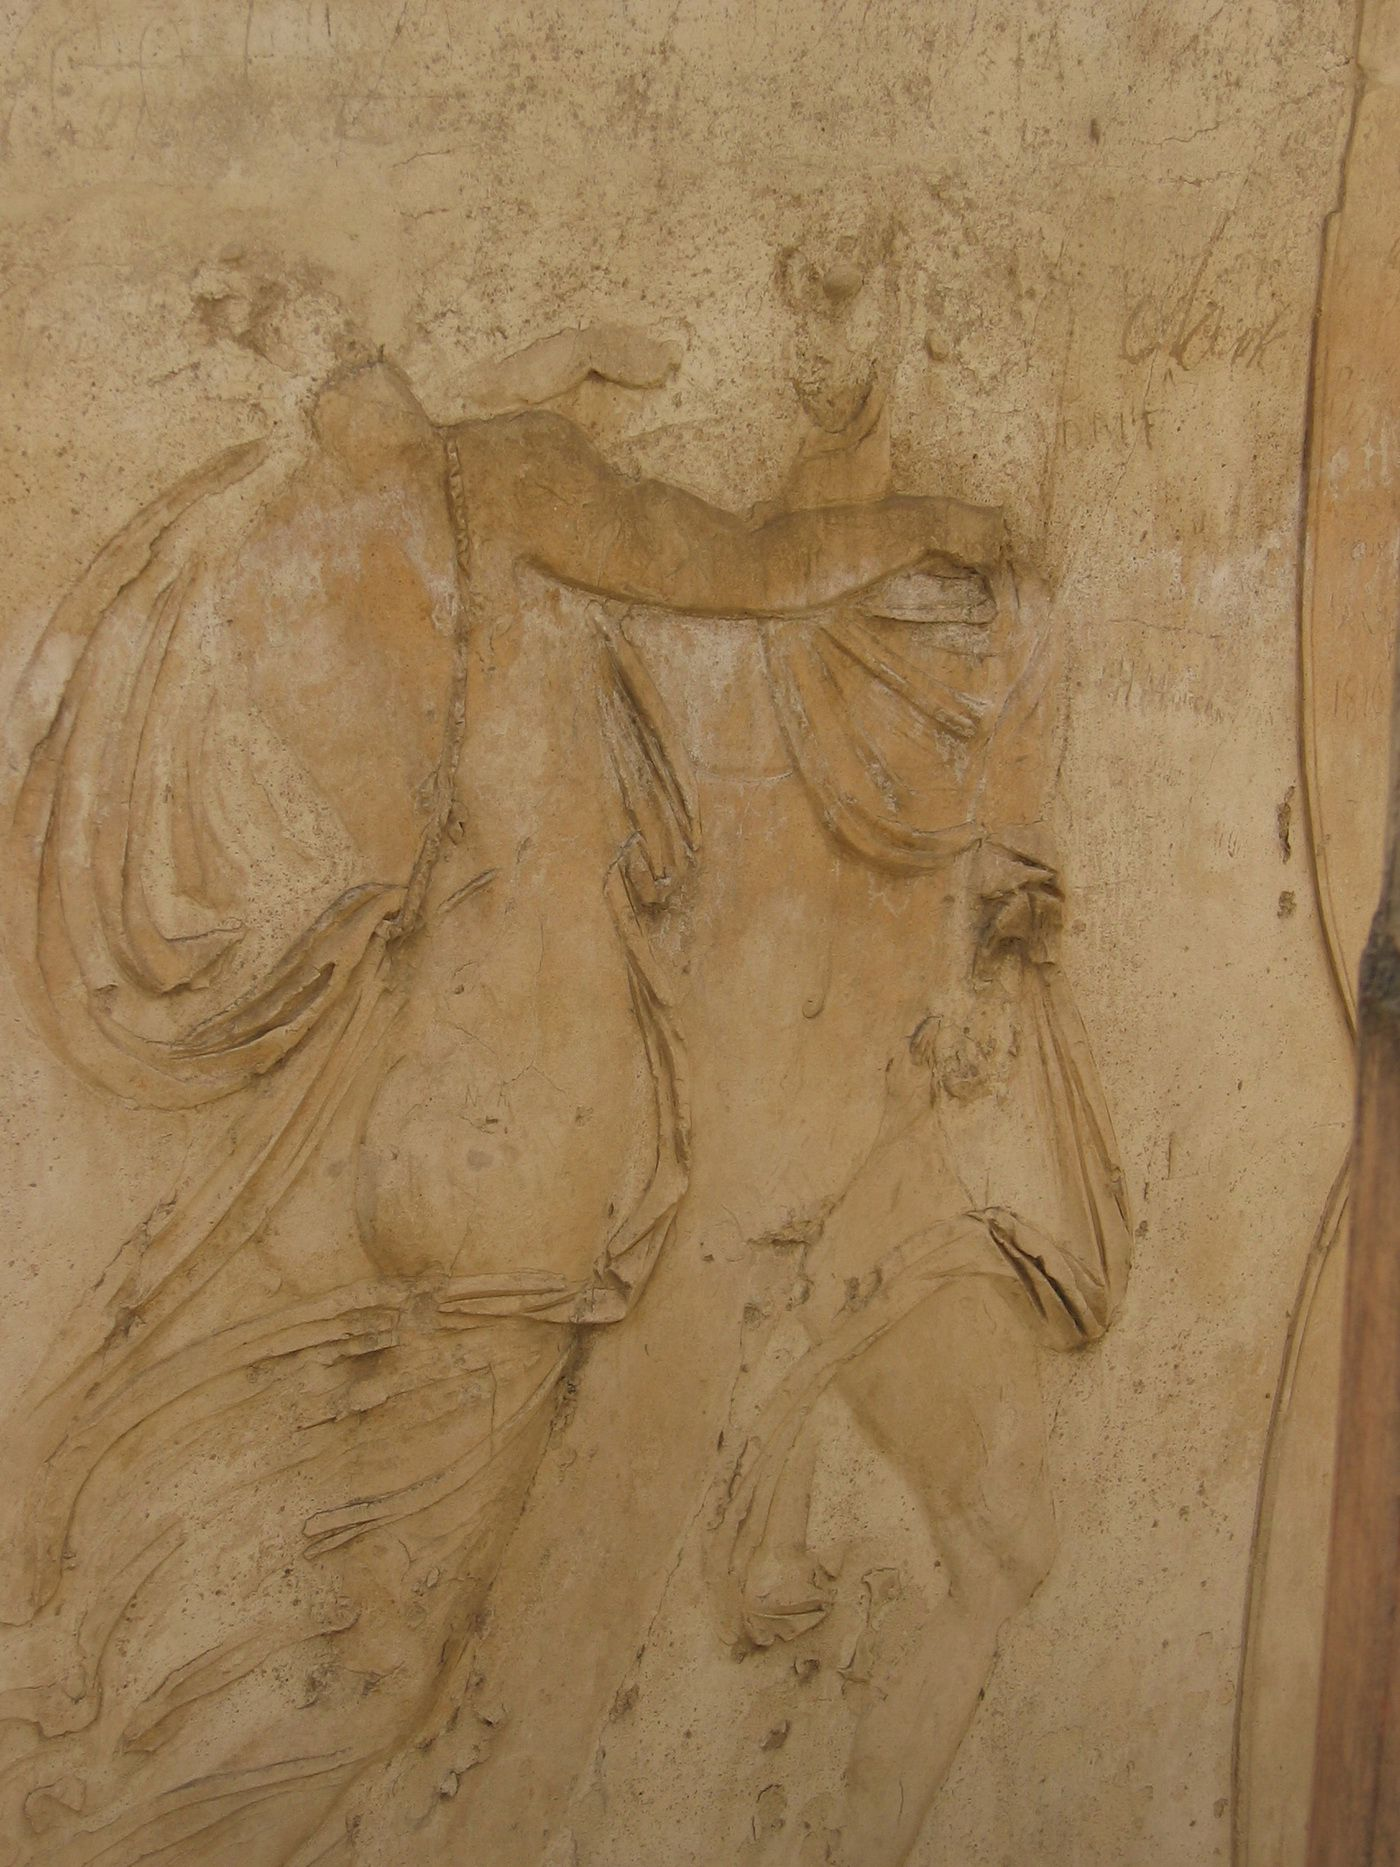 Pompei, bas-relief